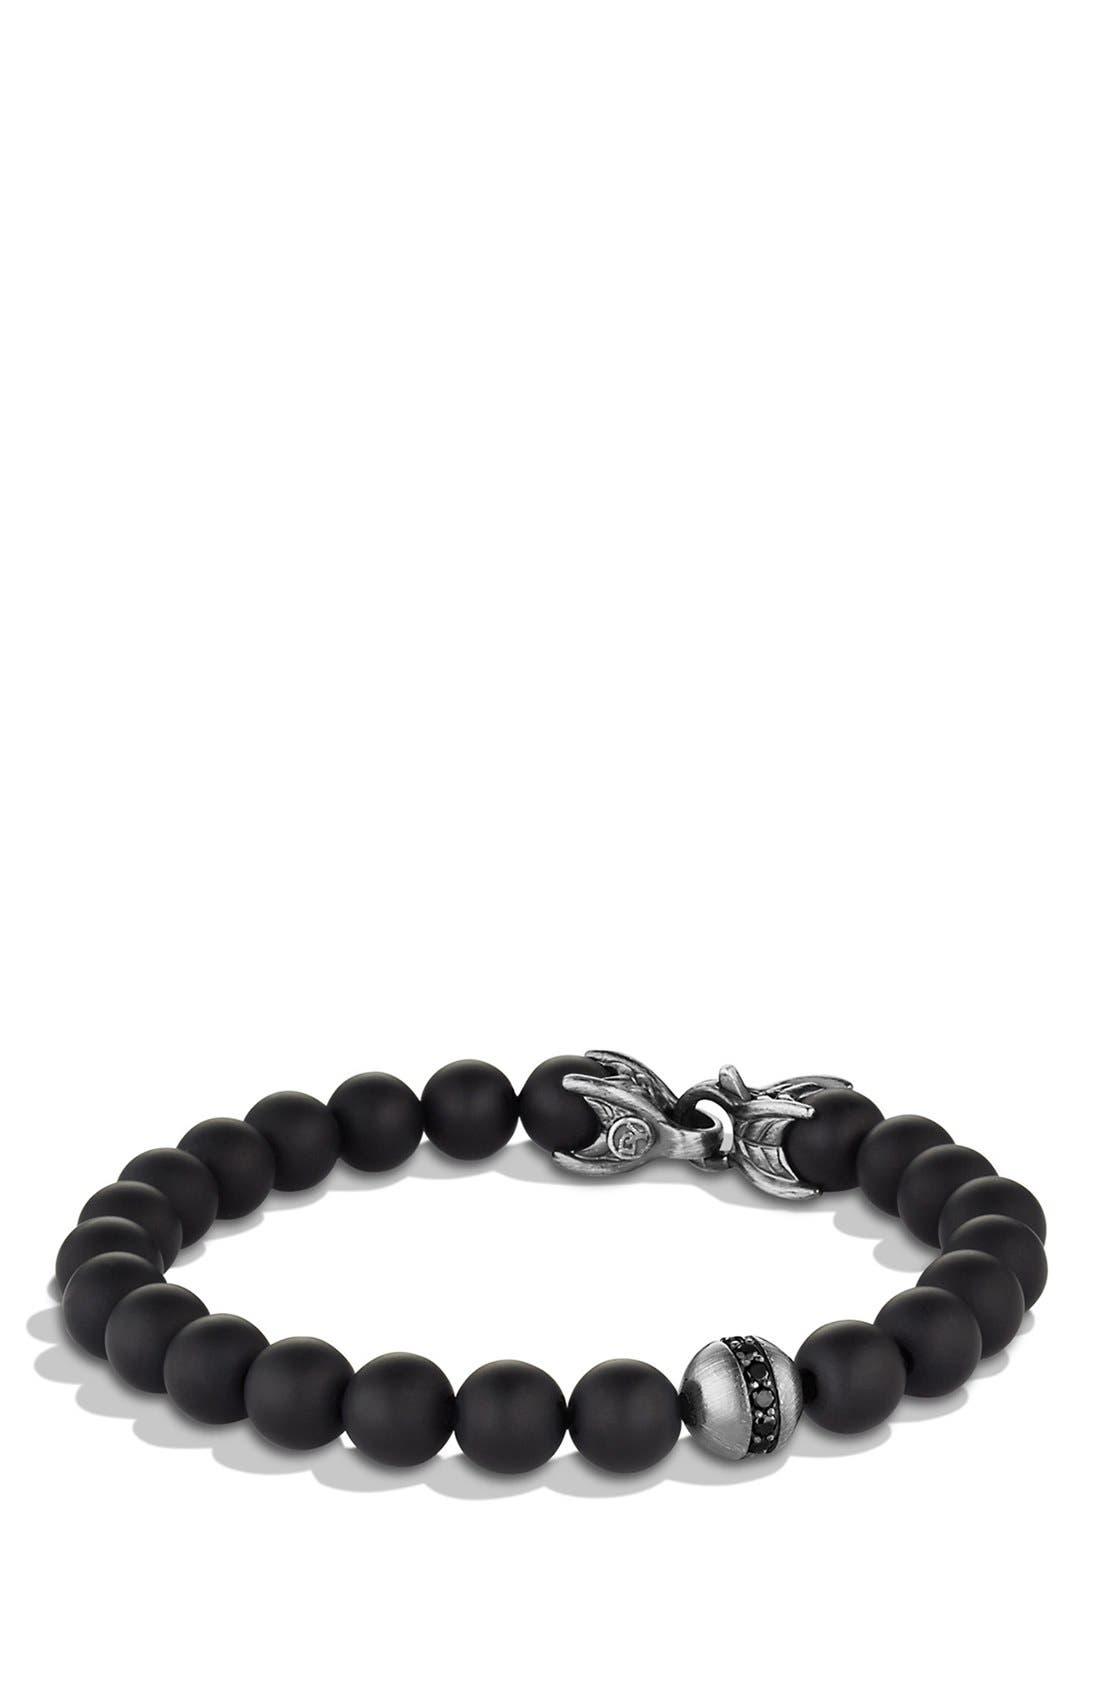 DAVID YURMAN 'Spiritual Beads' Bracelet with Black Onyx and Black Diamonds, Main, color, BLACK ONYX